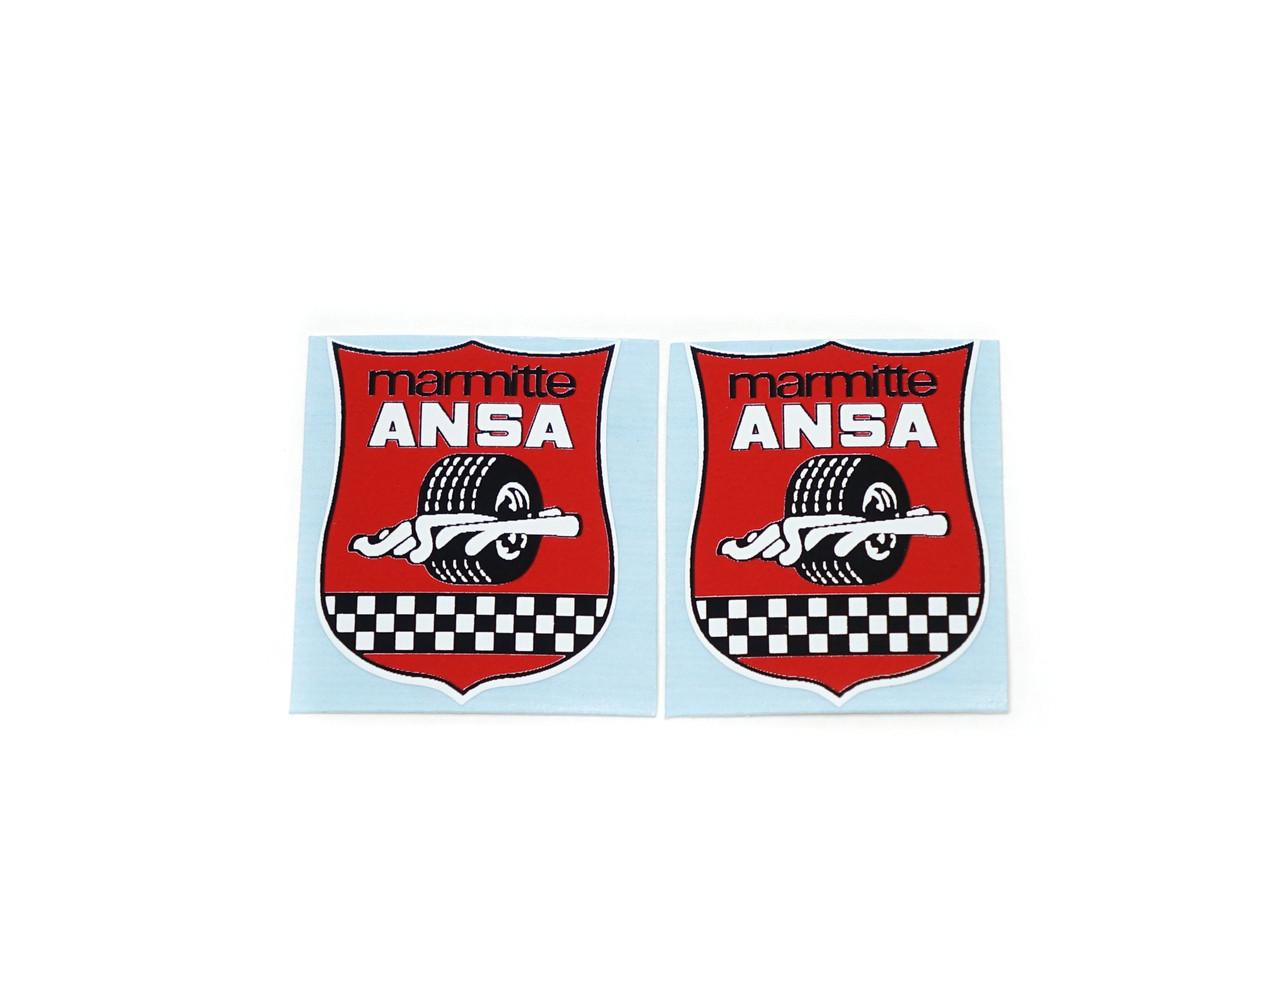 Marmitte Ansa Decal Pair - Small